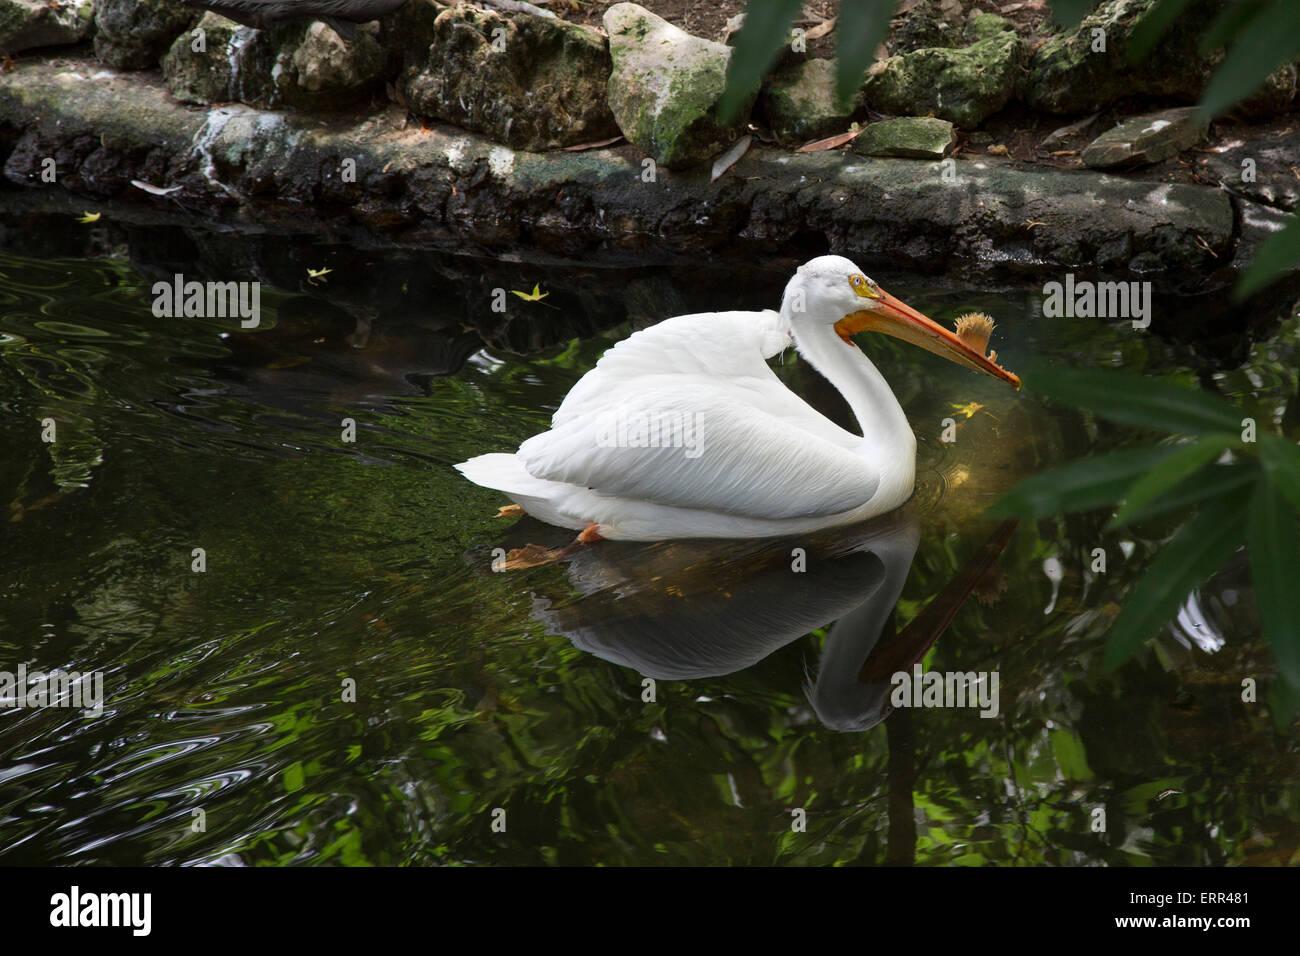 Homosassa Springs, Florida - An American white pelican (Pelecanus erythrorhynchos) at Homosassa Springs Wildlife - Stock Image